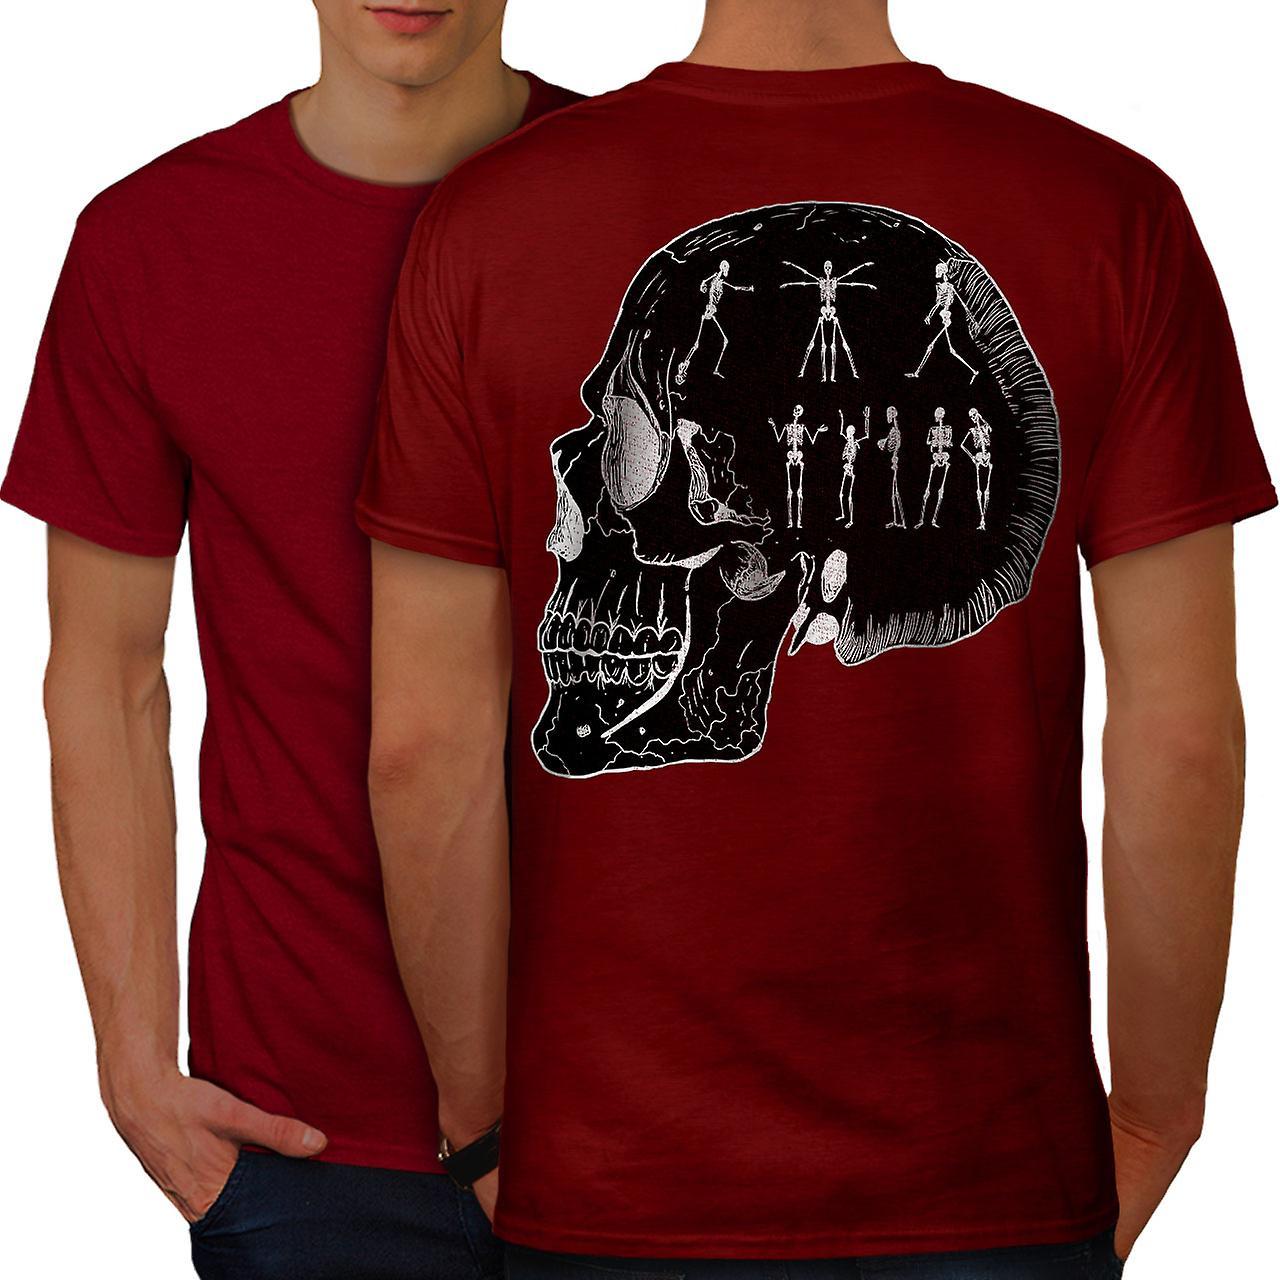 6452ffc3c120b4 Party Skelett coole Männer RedT-Hemd zurück